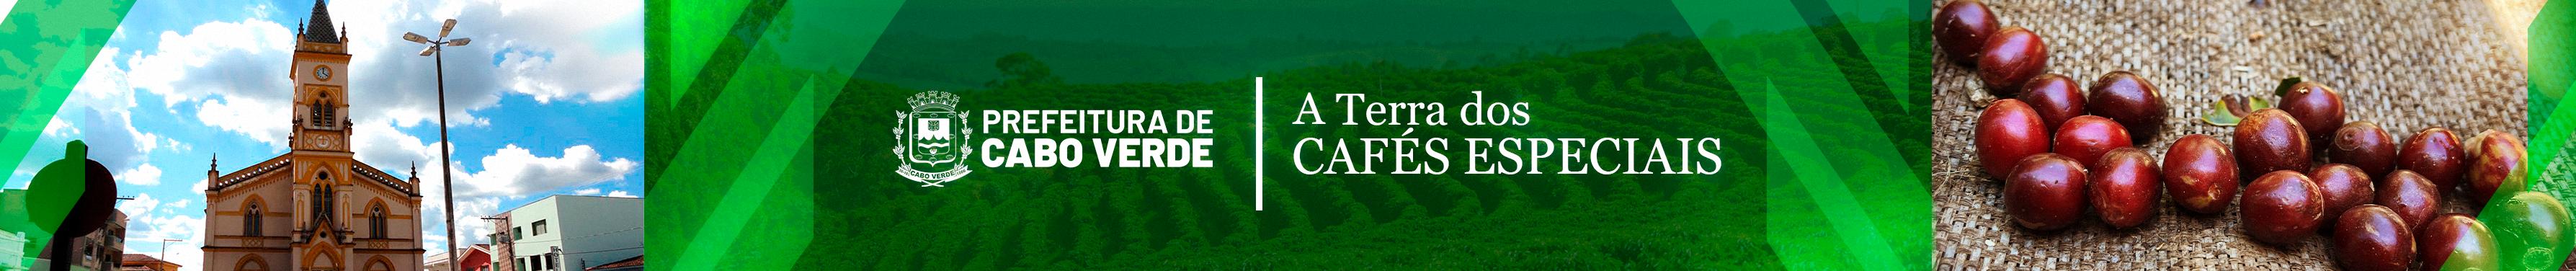 Prefeitura municipal de Cabo Verde